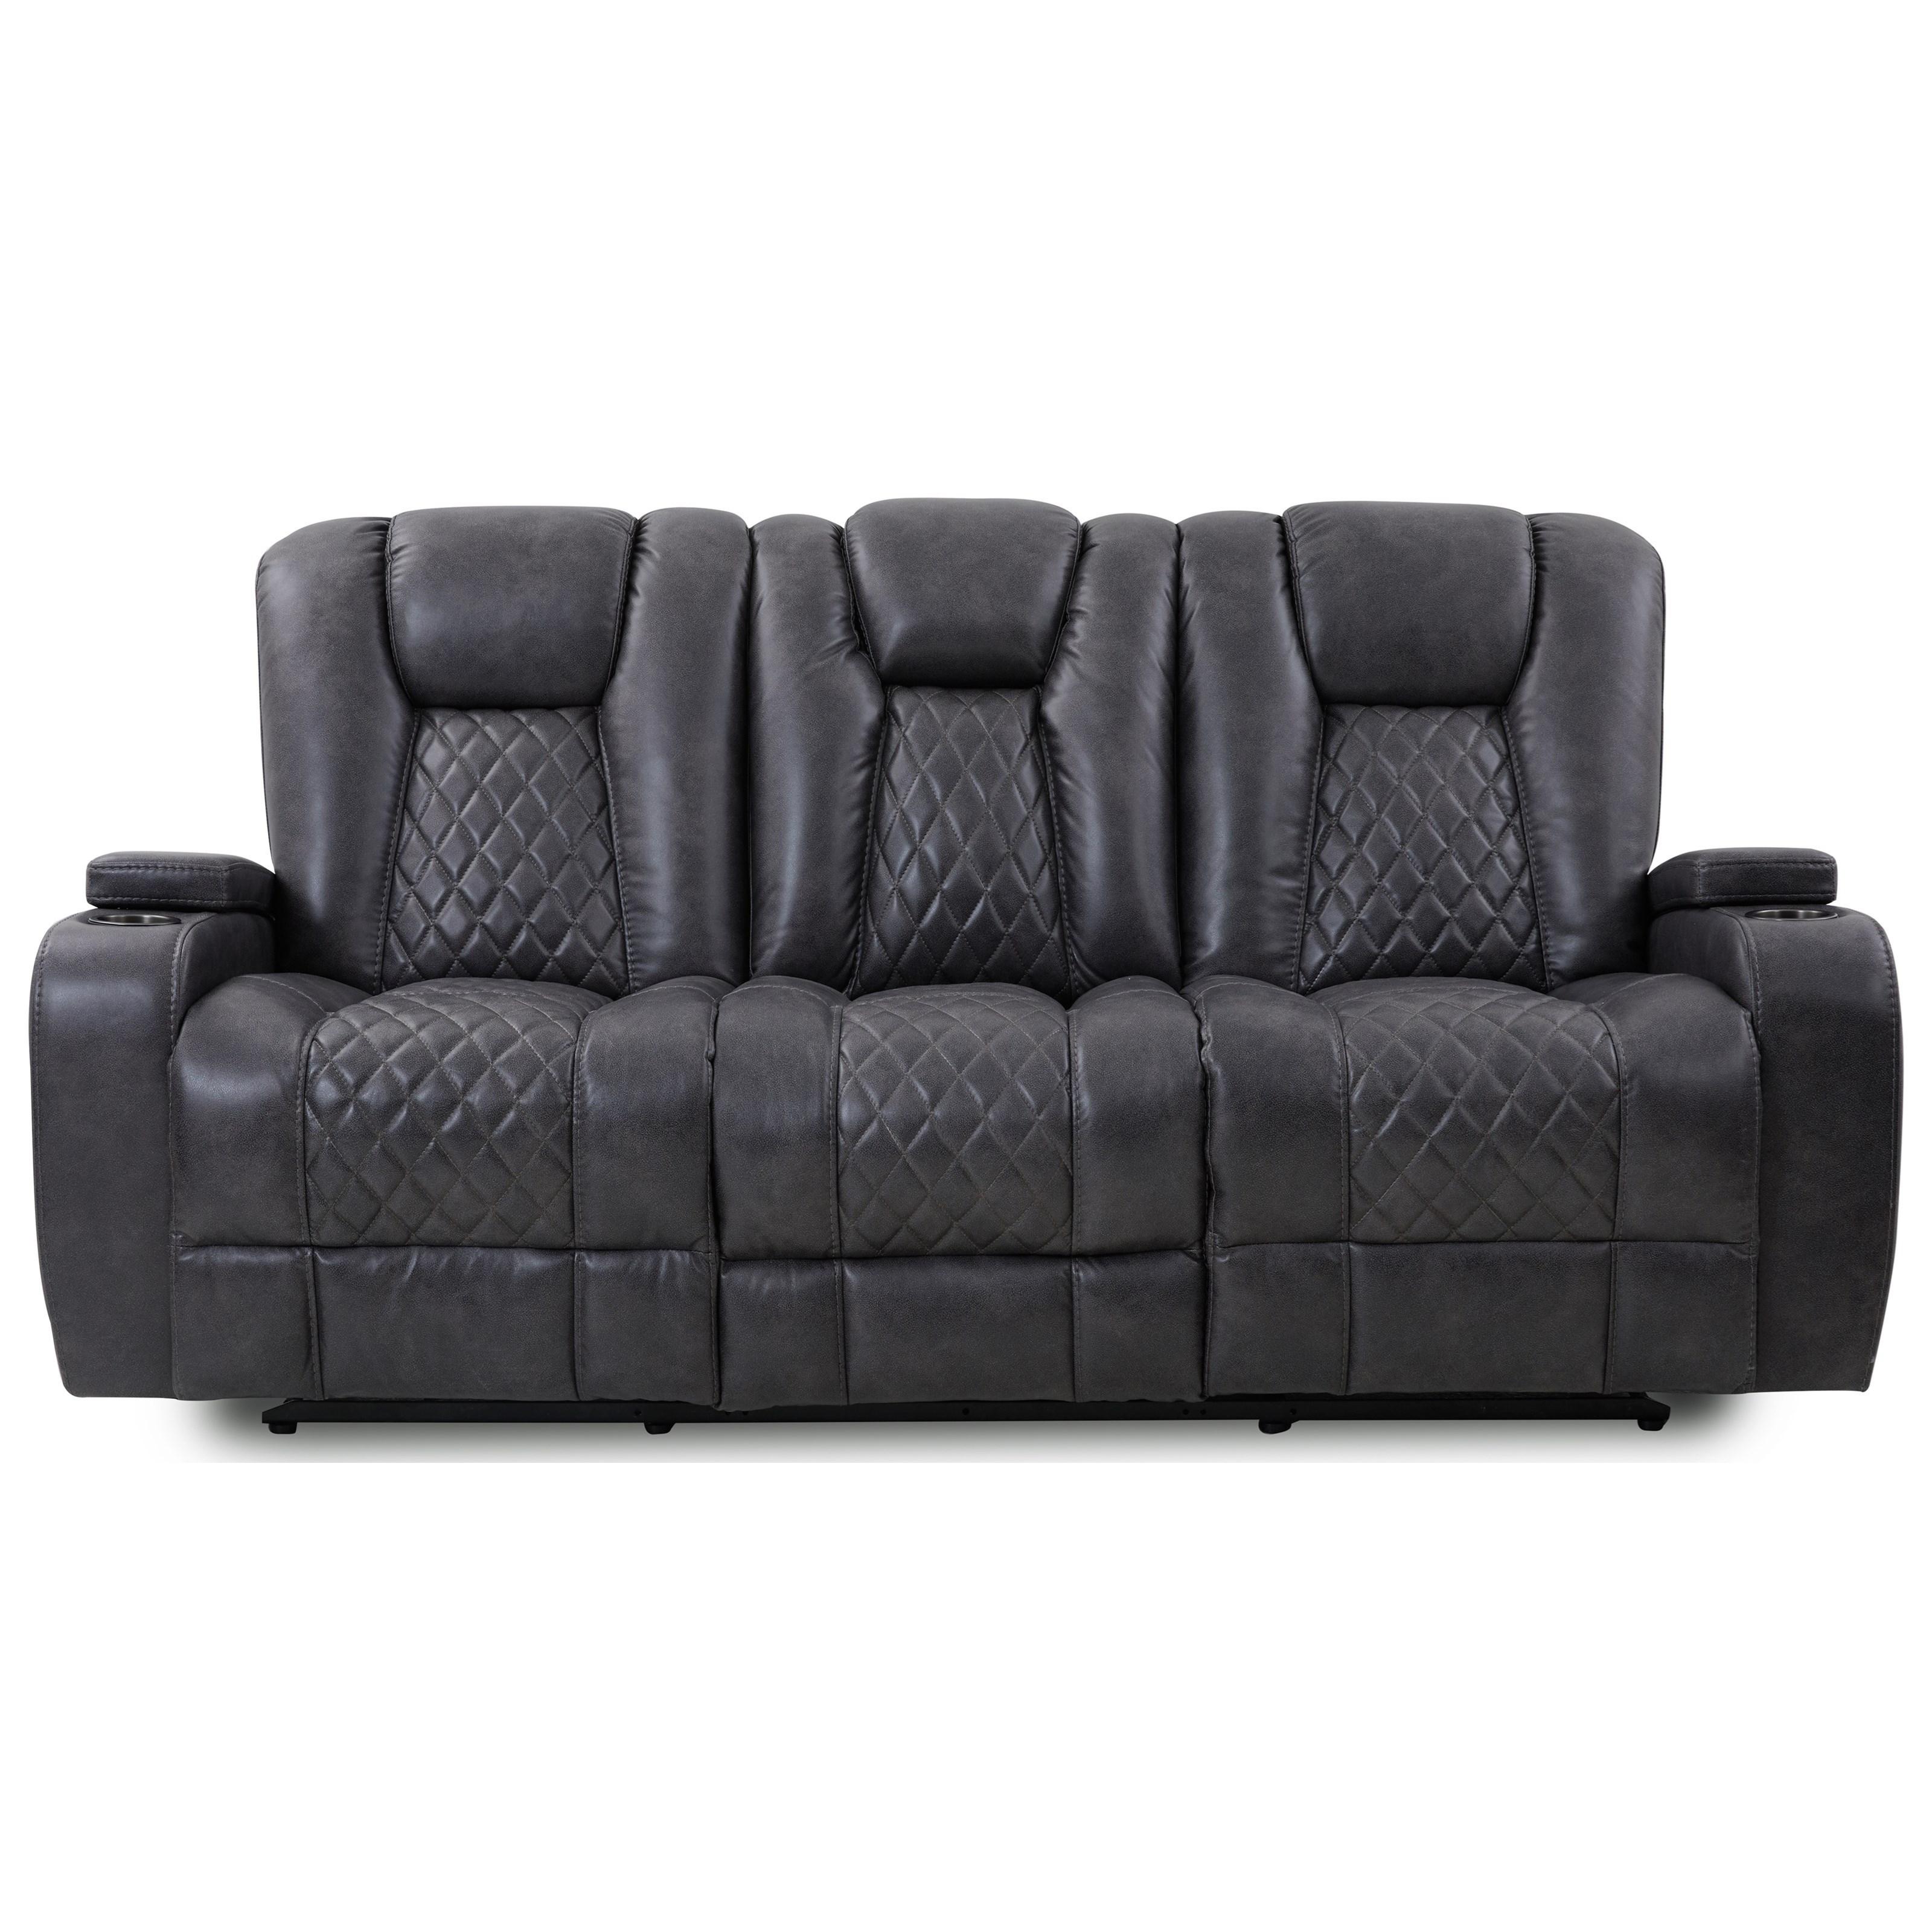 Waylon Reclining Sofa at Walker's Furniture